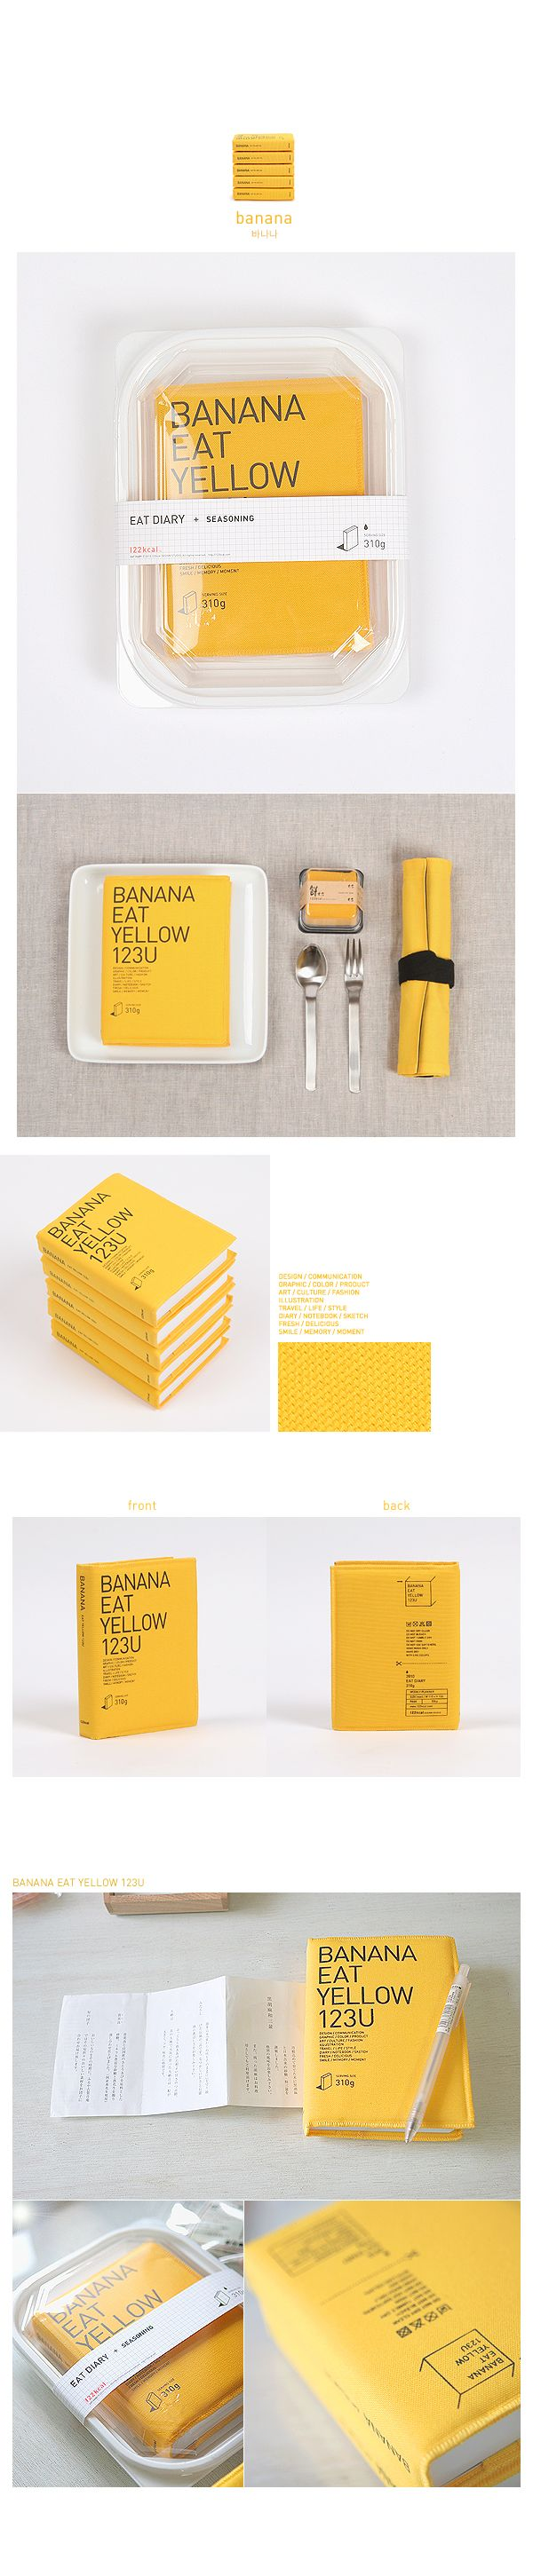 Banana Agenda #packaging #branding #marketing PD